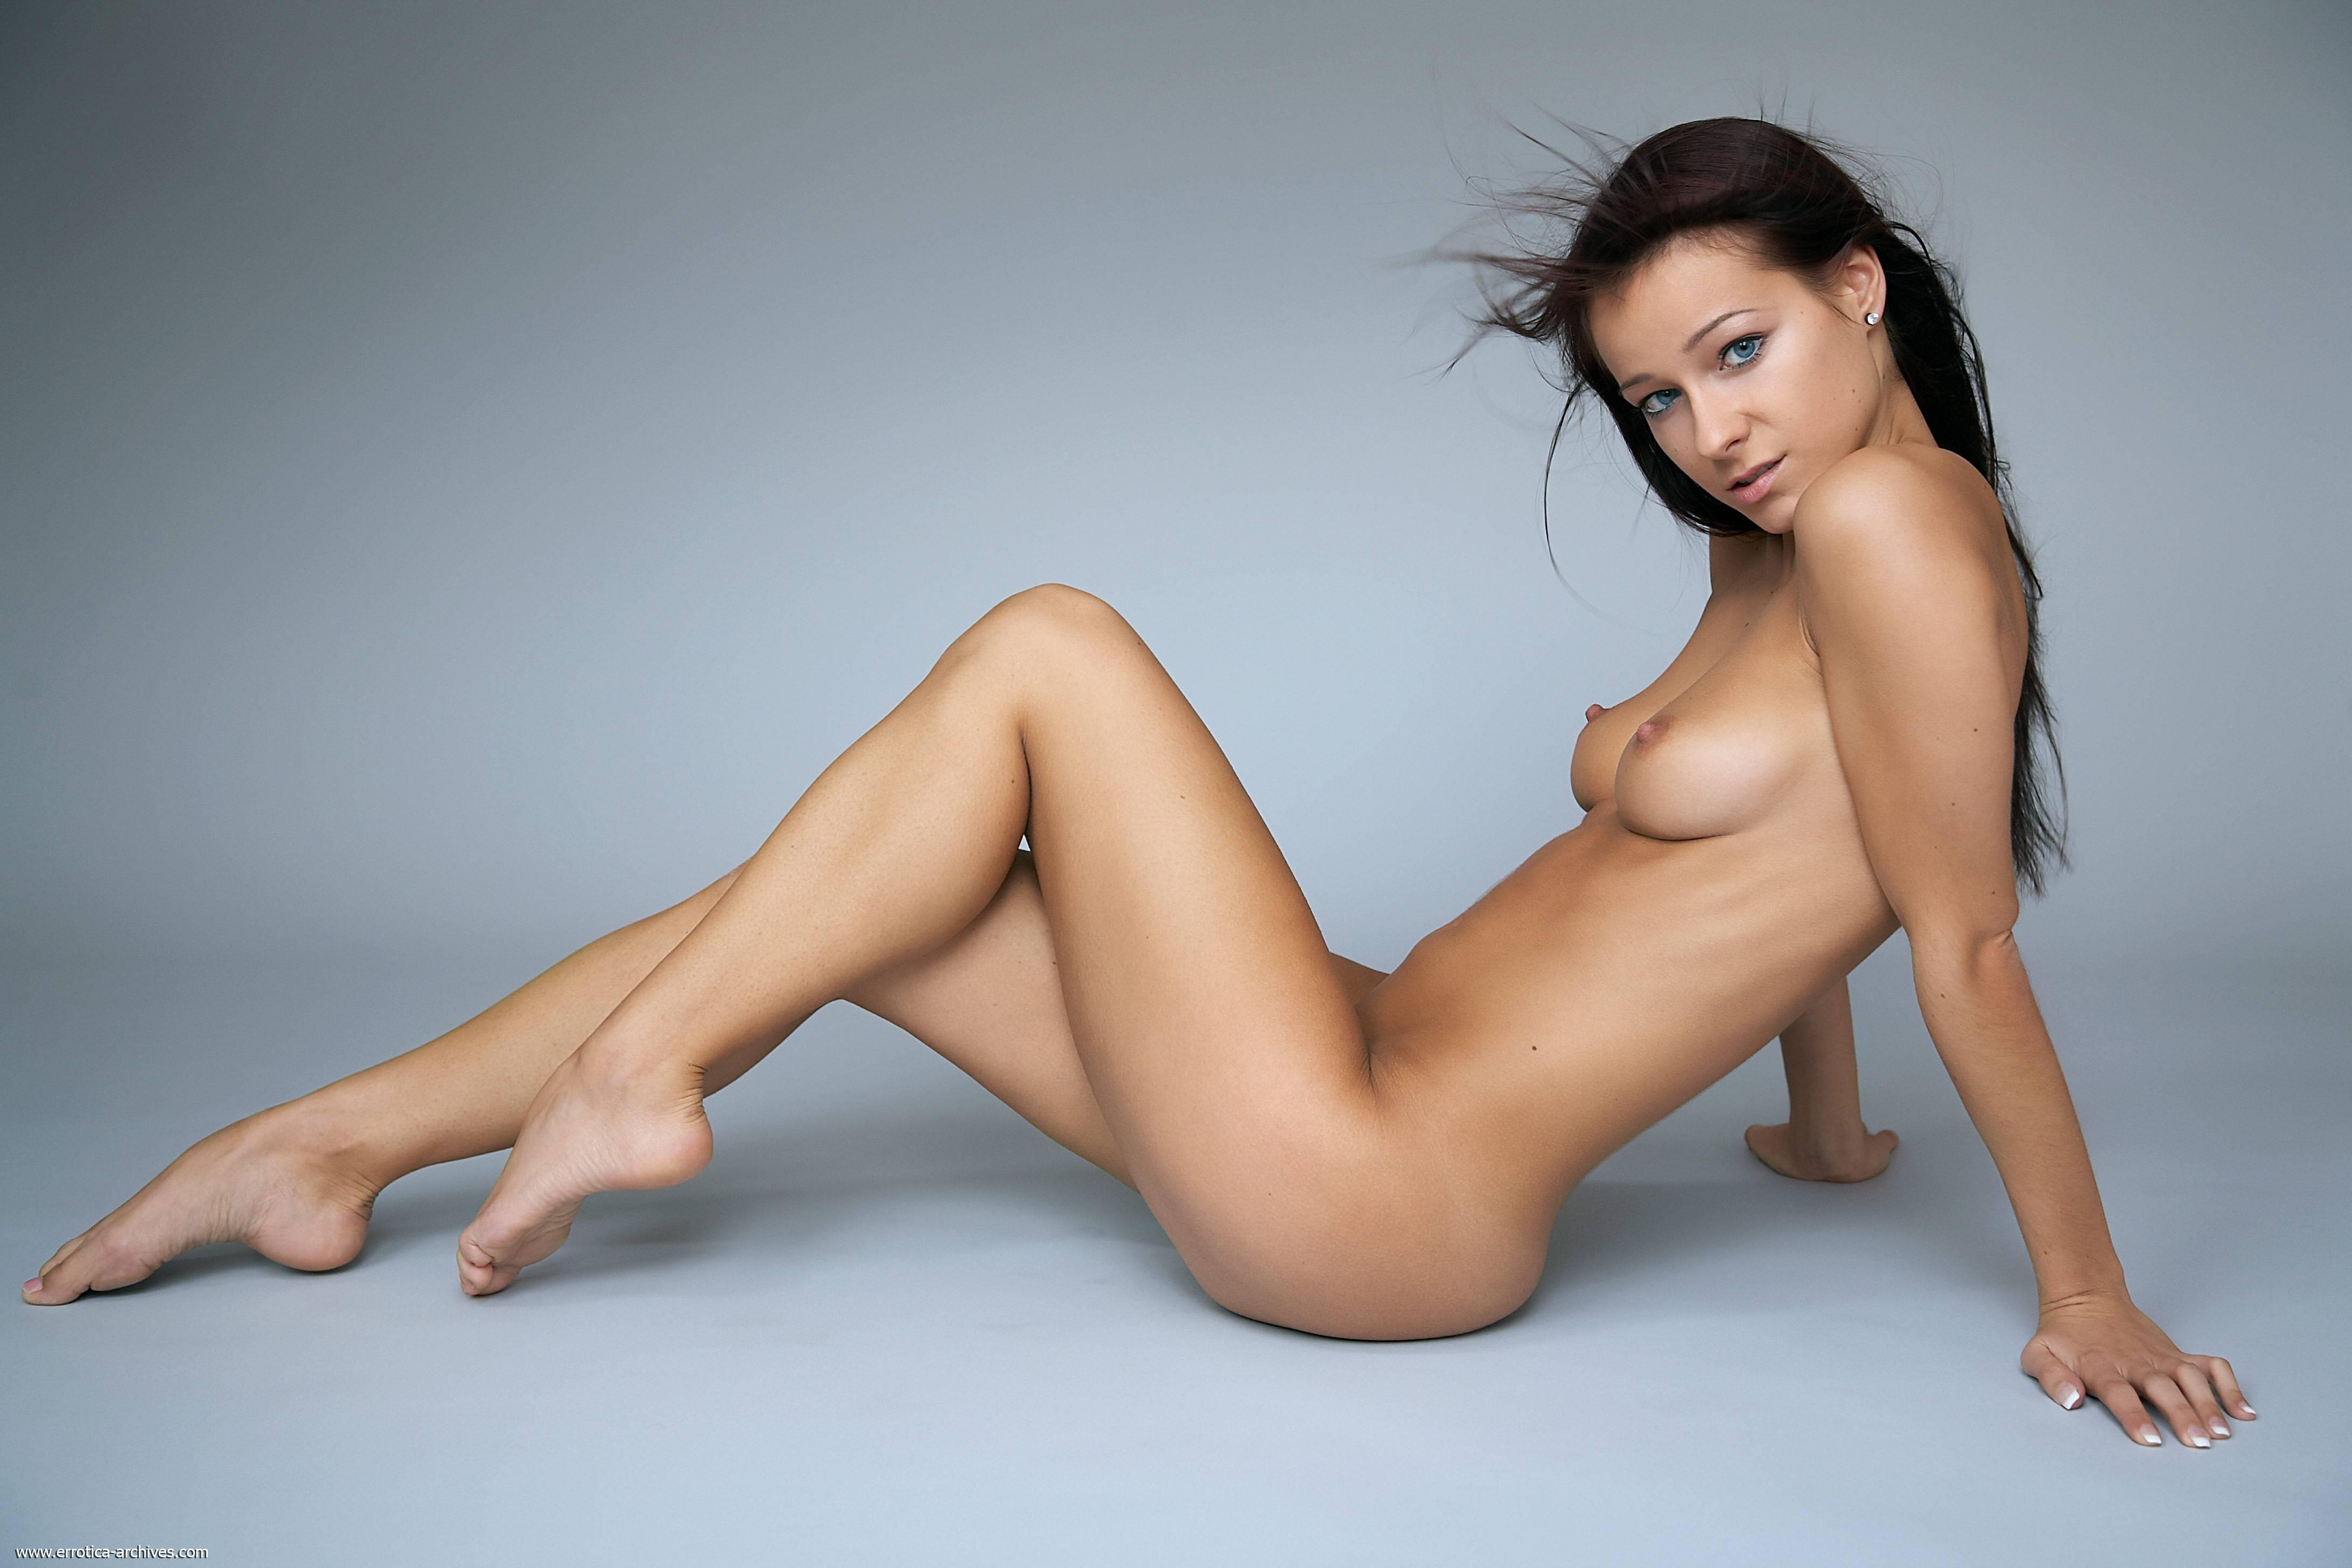 fotos-full-size-nude-gratis